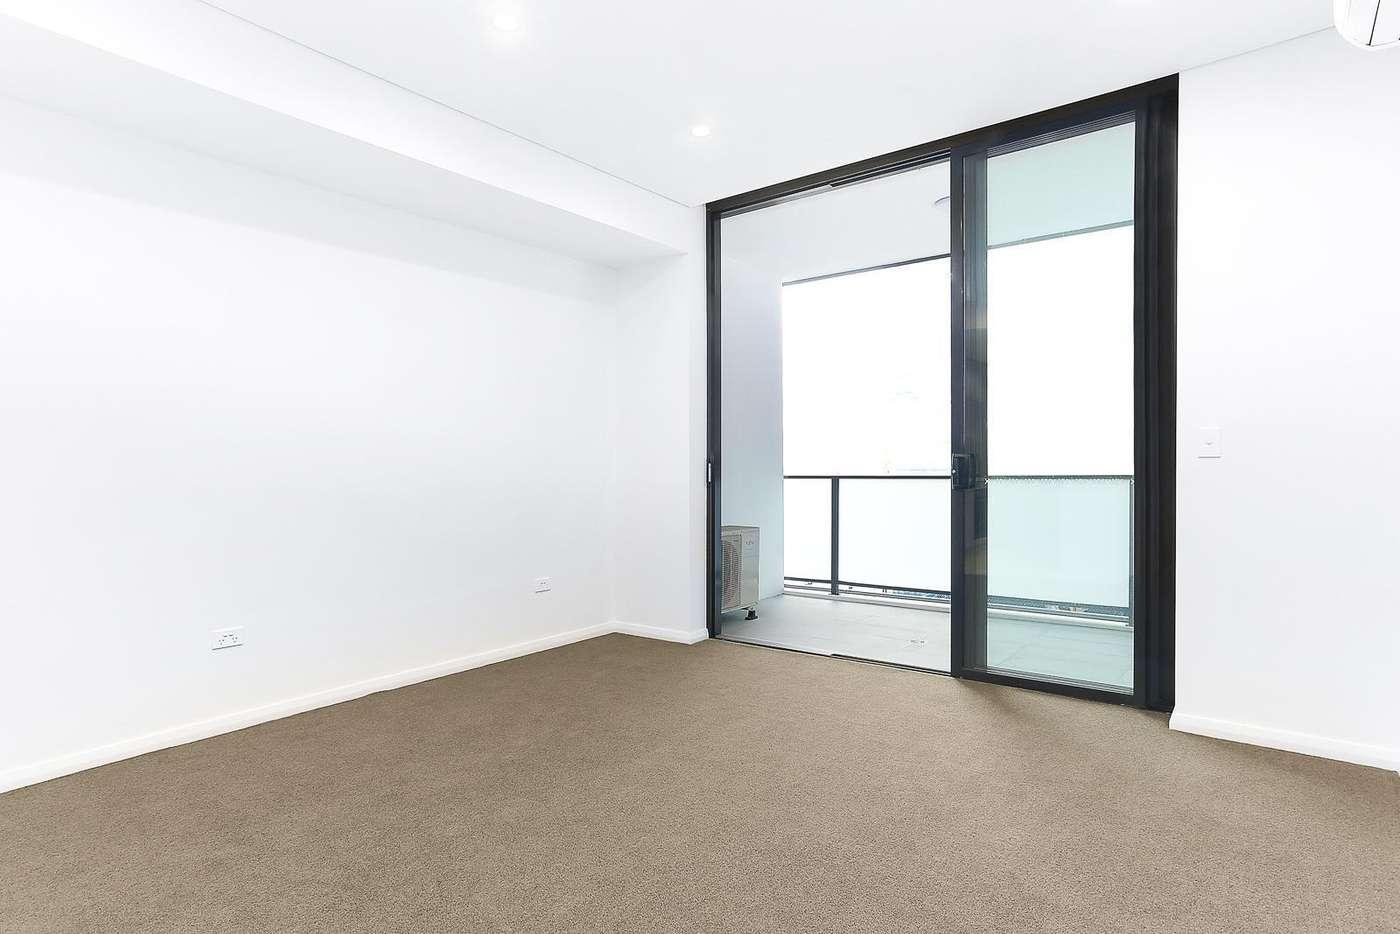 Main view of Homely apartment listing, B706/12-22 Woniora Road, Hurstville NSW 2220